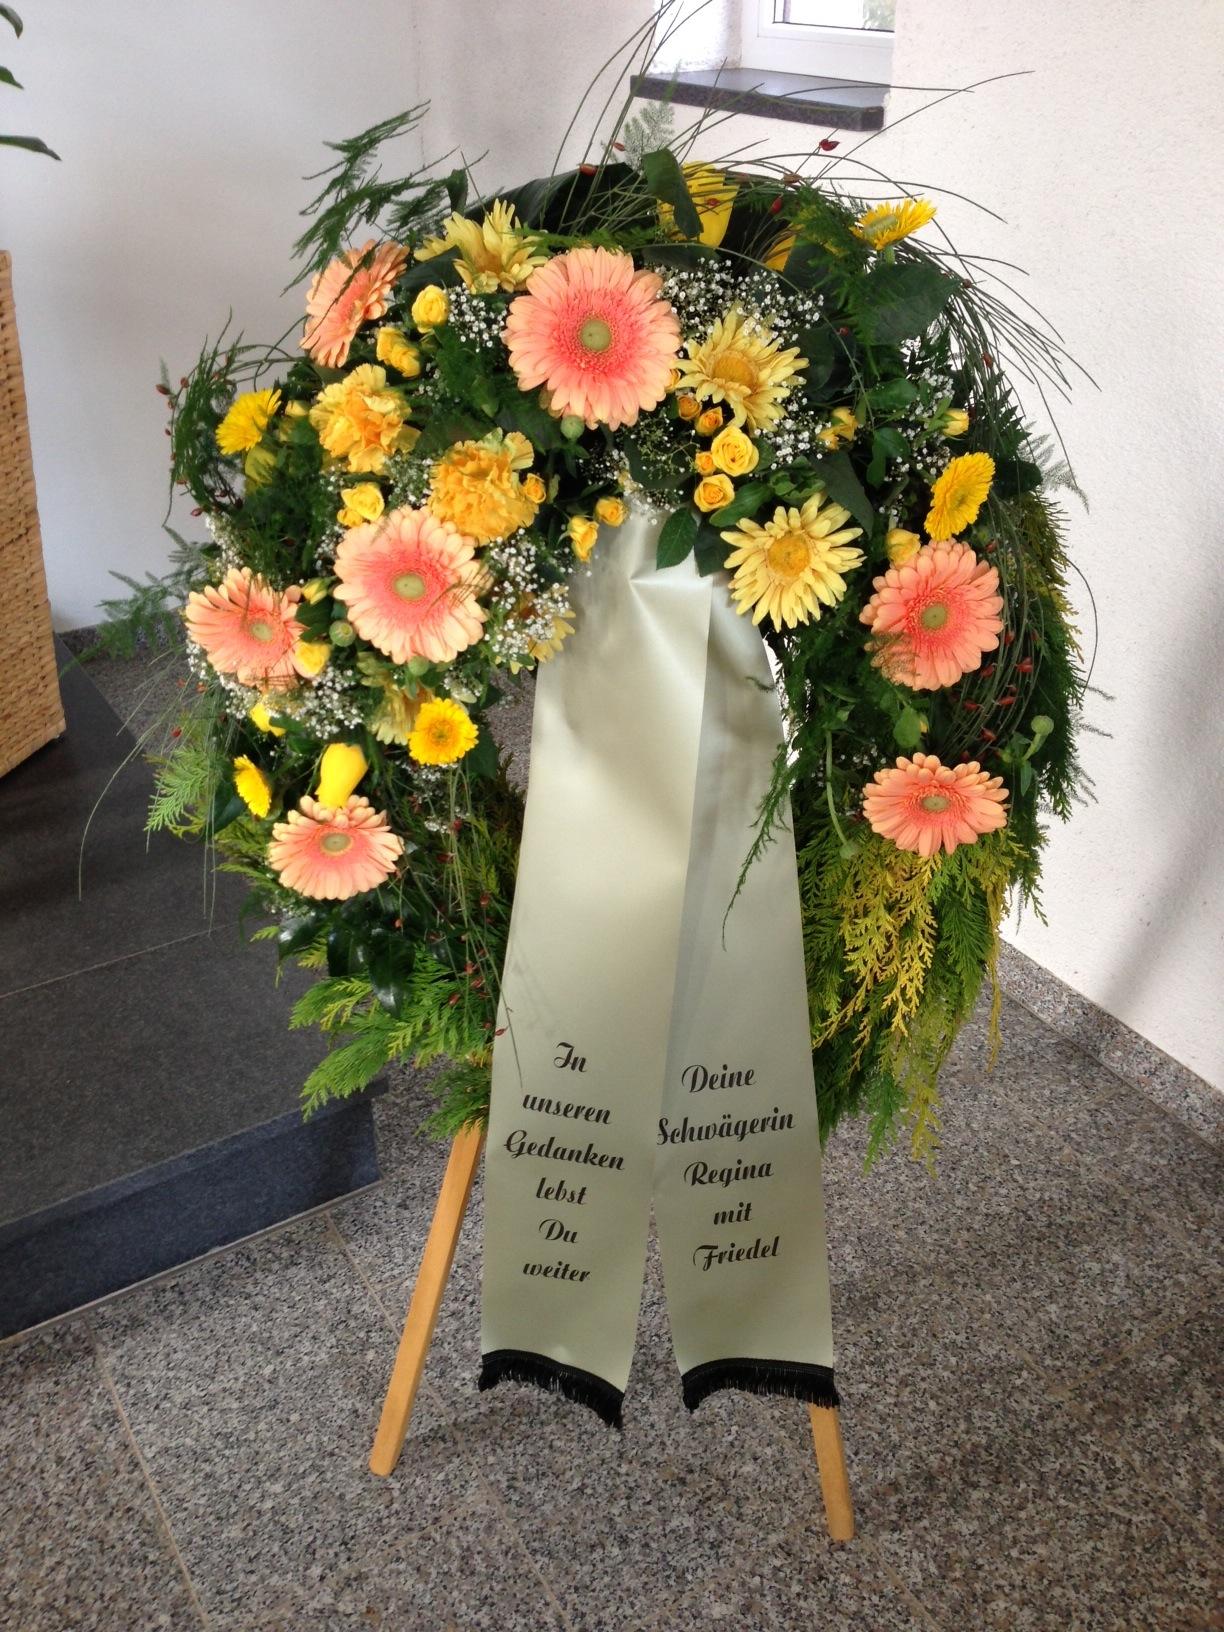 Berühmt Blattwerk Floristik, Blumen und Dekoration, Berlingerode &OA_92